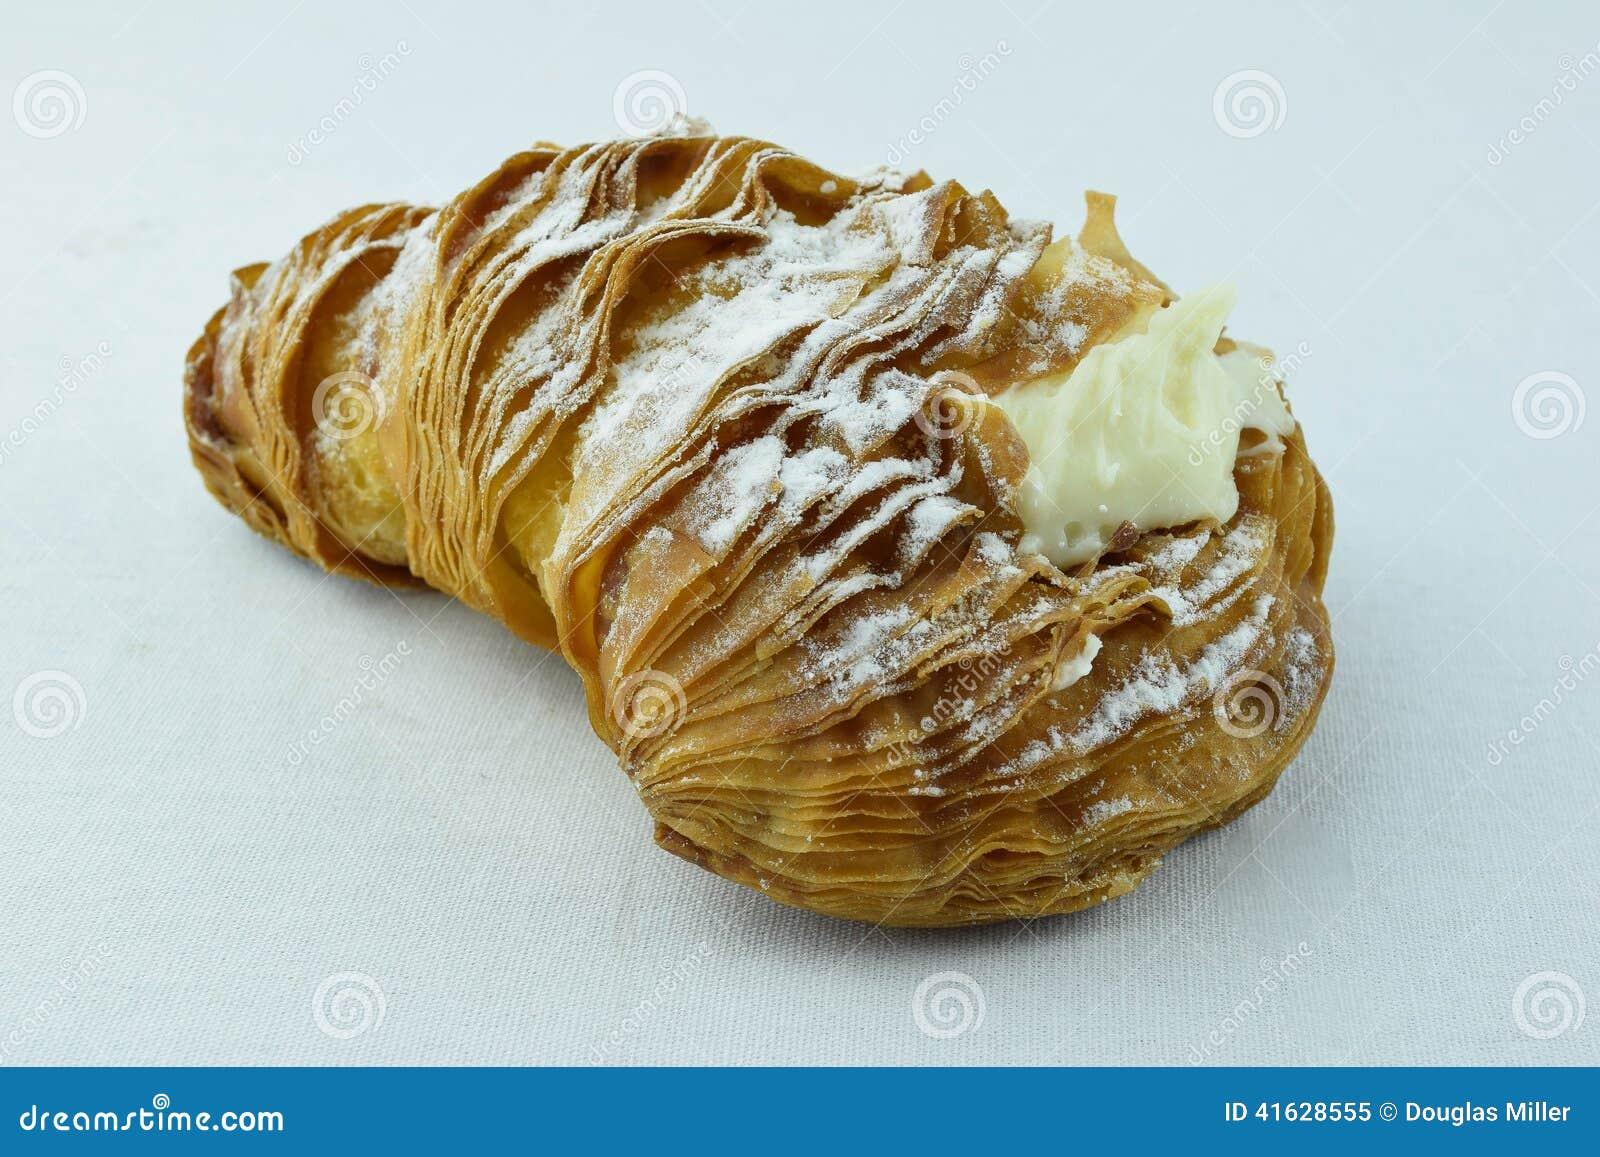 Libre de droits. Download Pâtisserie De Queue De Homard